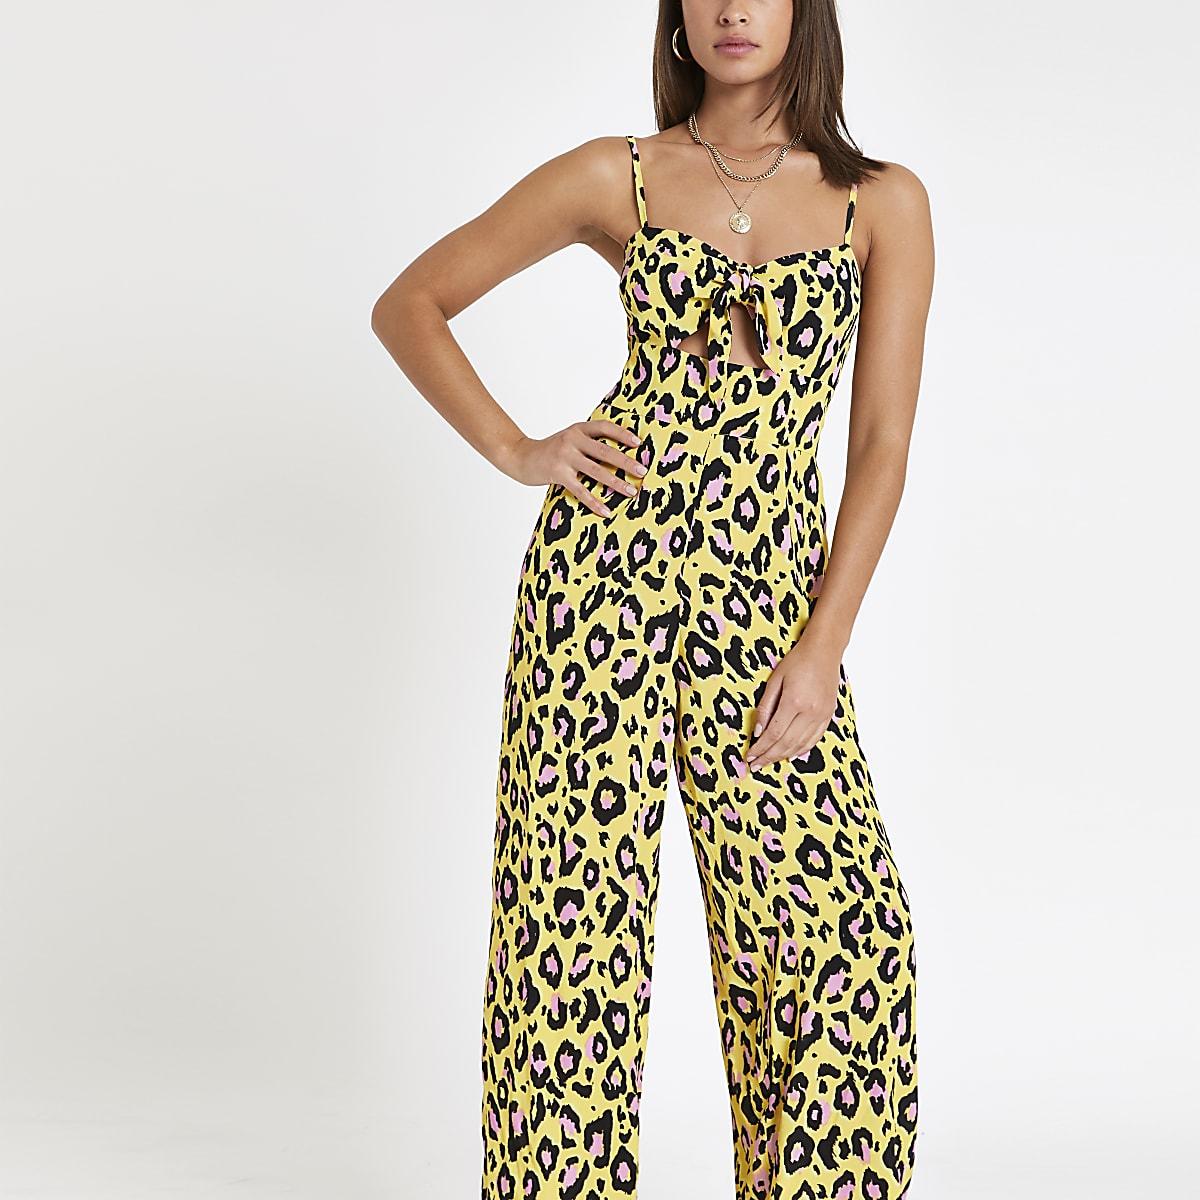 Gele jumpsuit met luipaardprint en strik voor